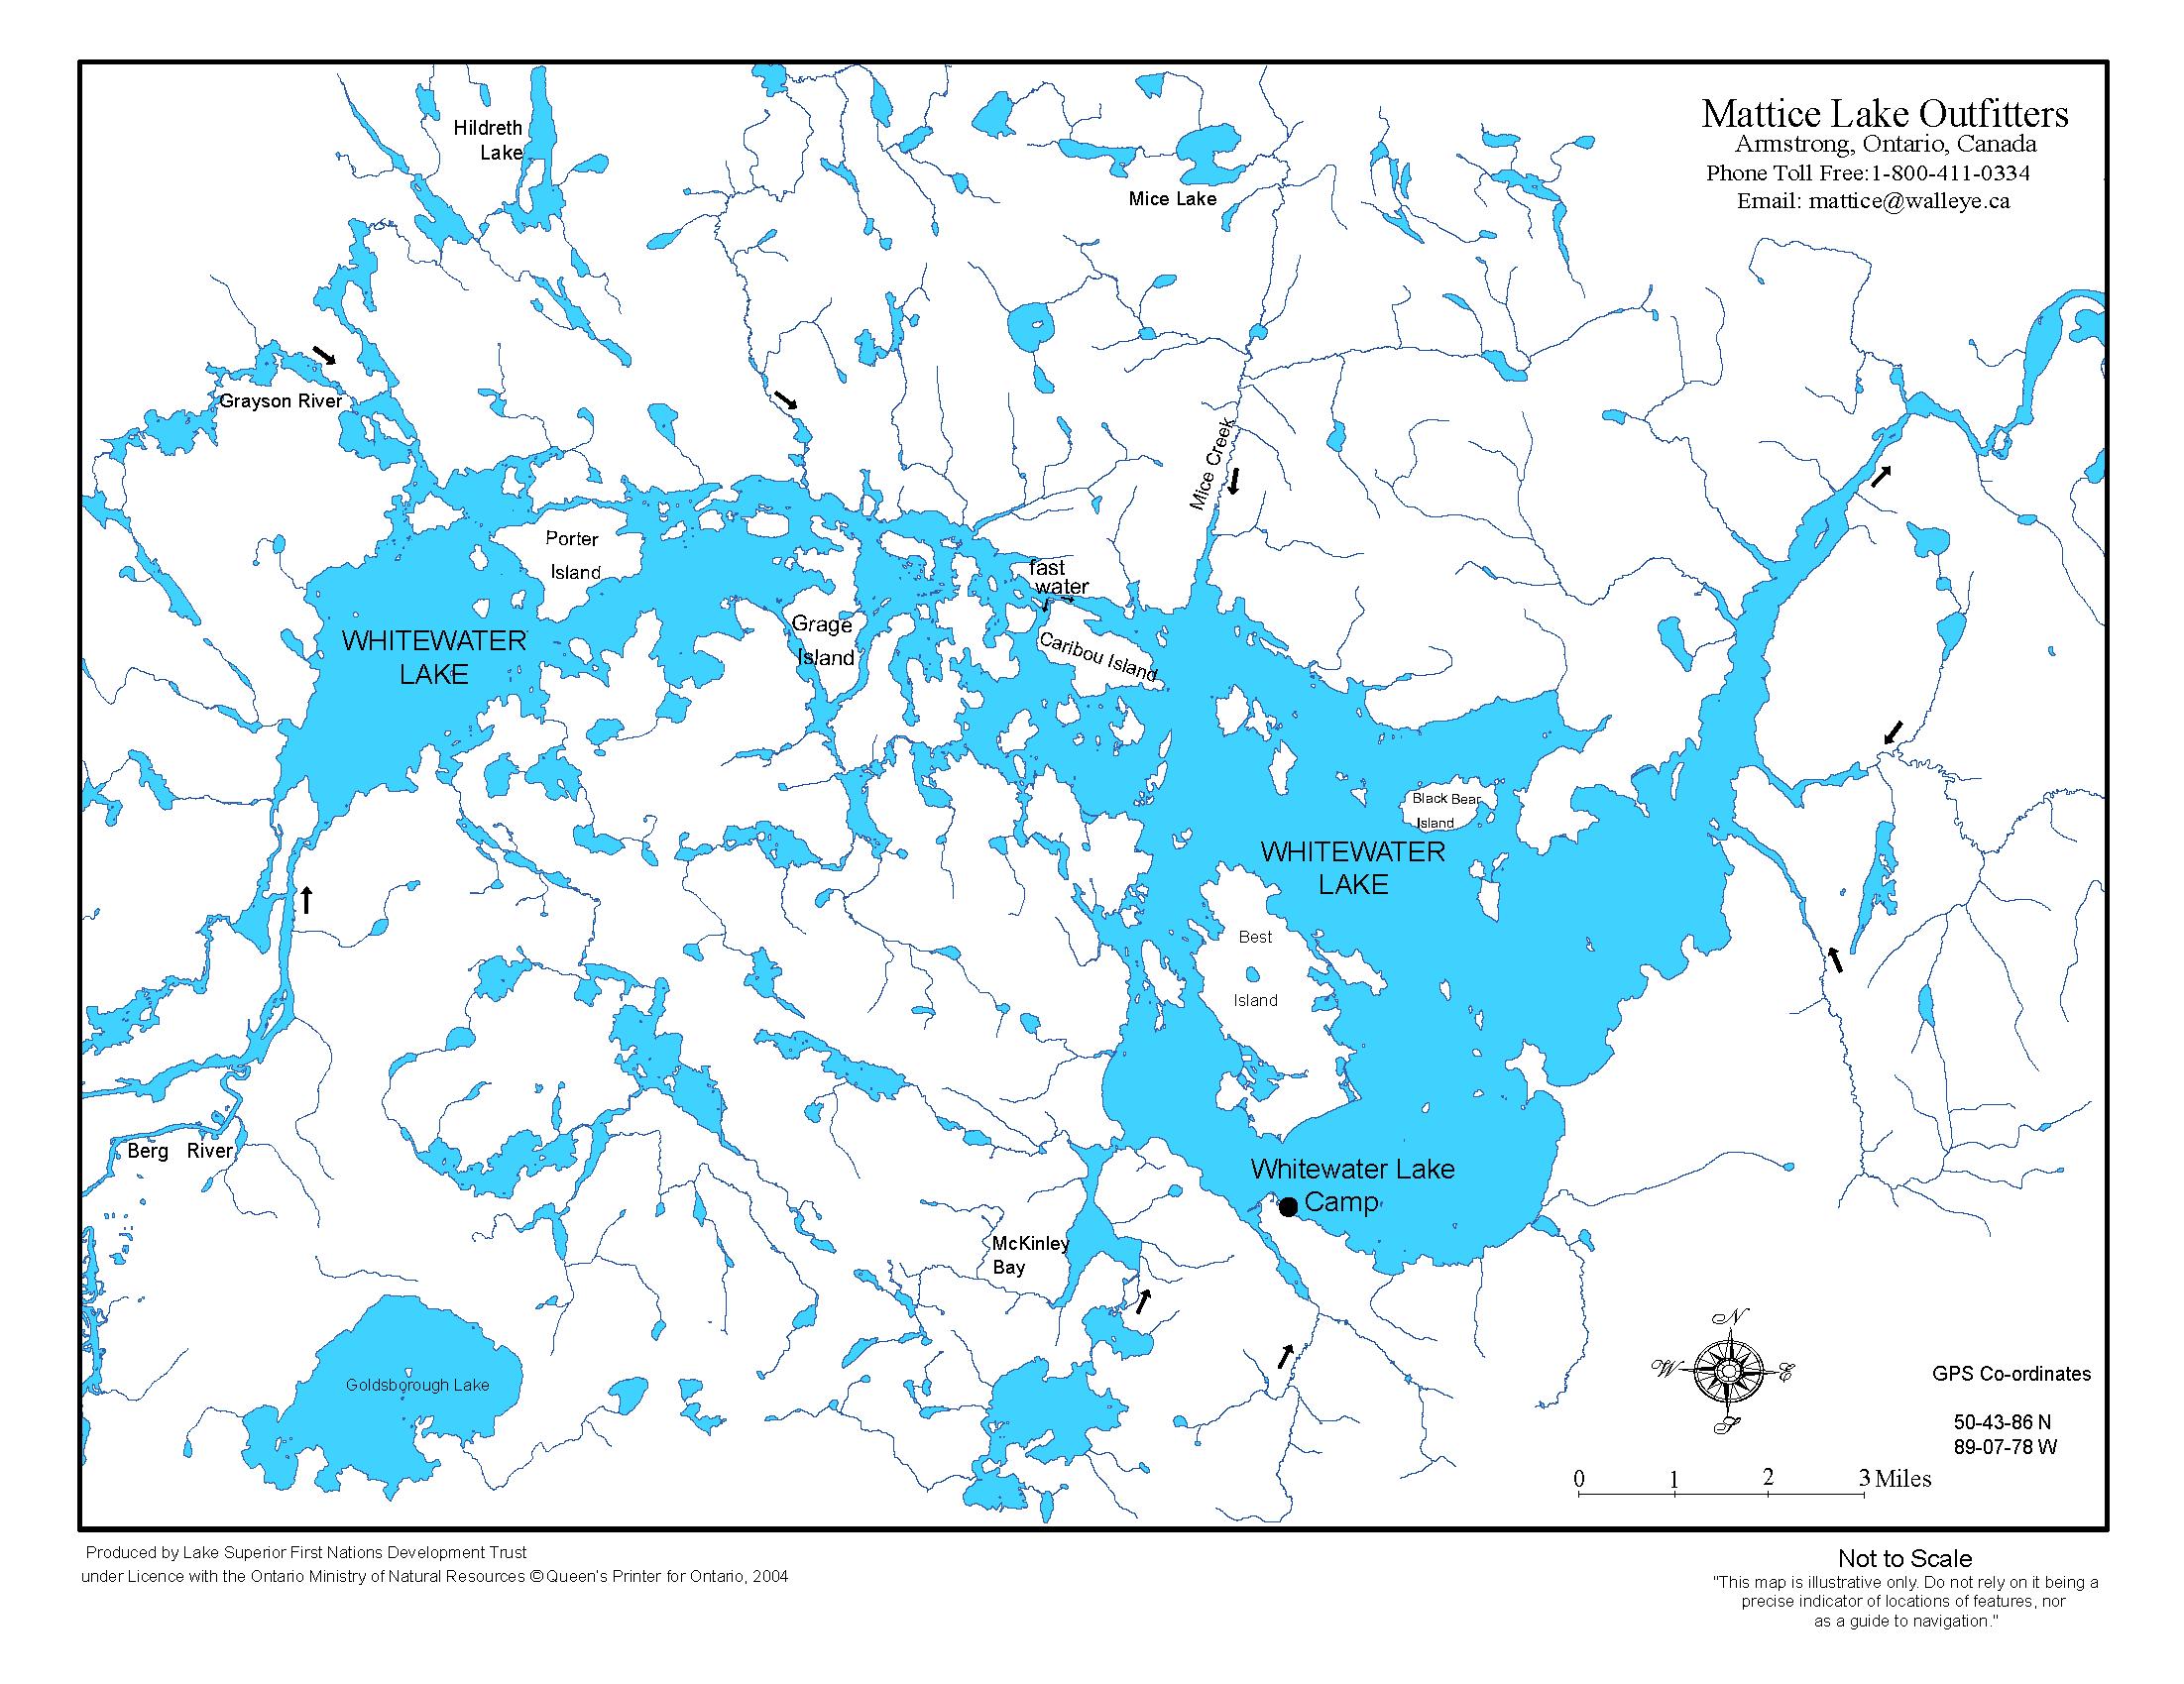 Whitewater Lake Ontario Northern Pike Fishing & Lodging | Mattice ...